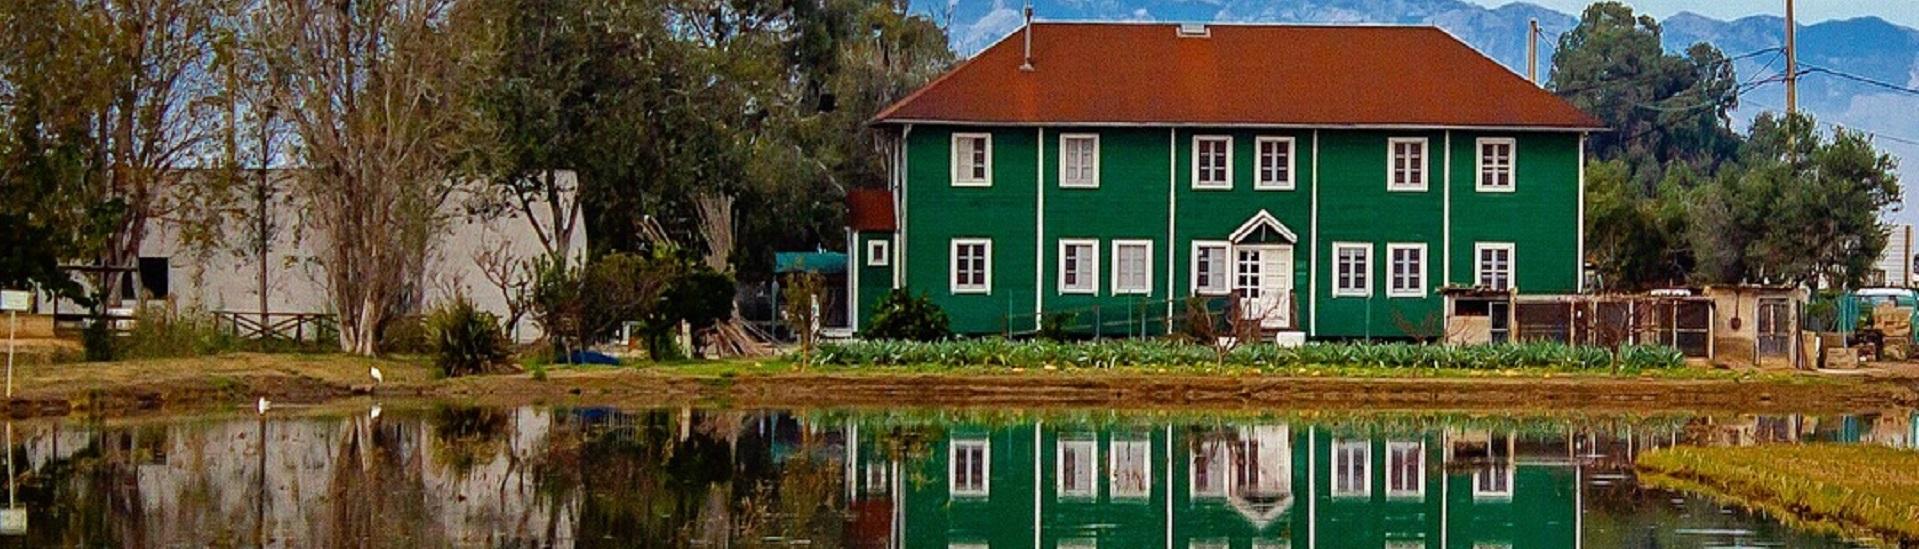 casa de fusta 1920 550 | Turismo Delta del Ebro